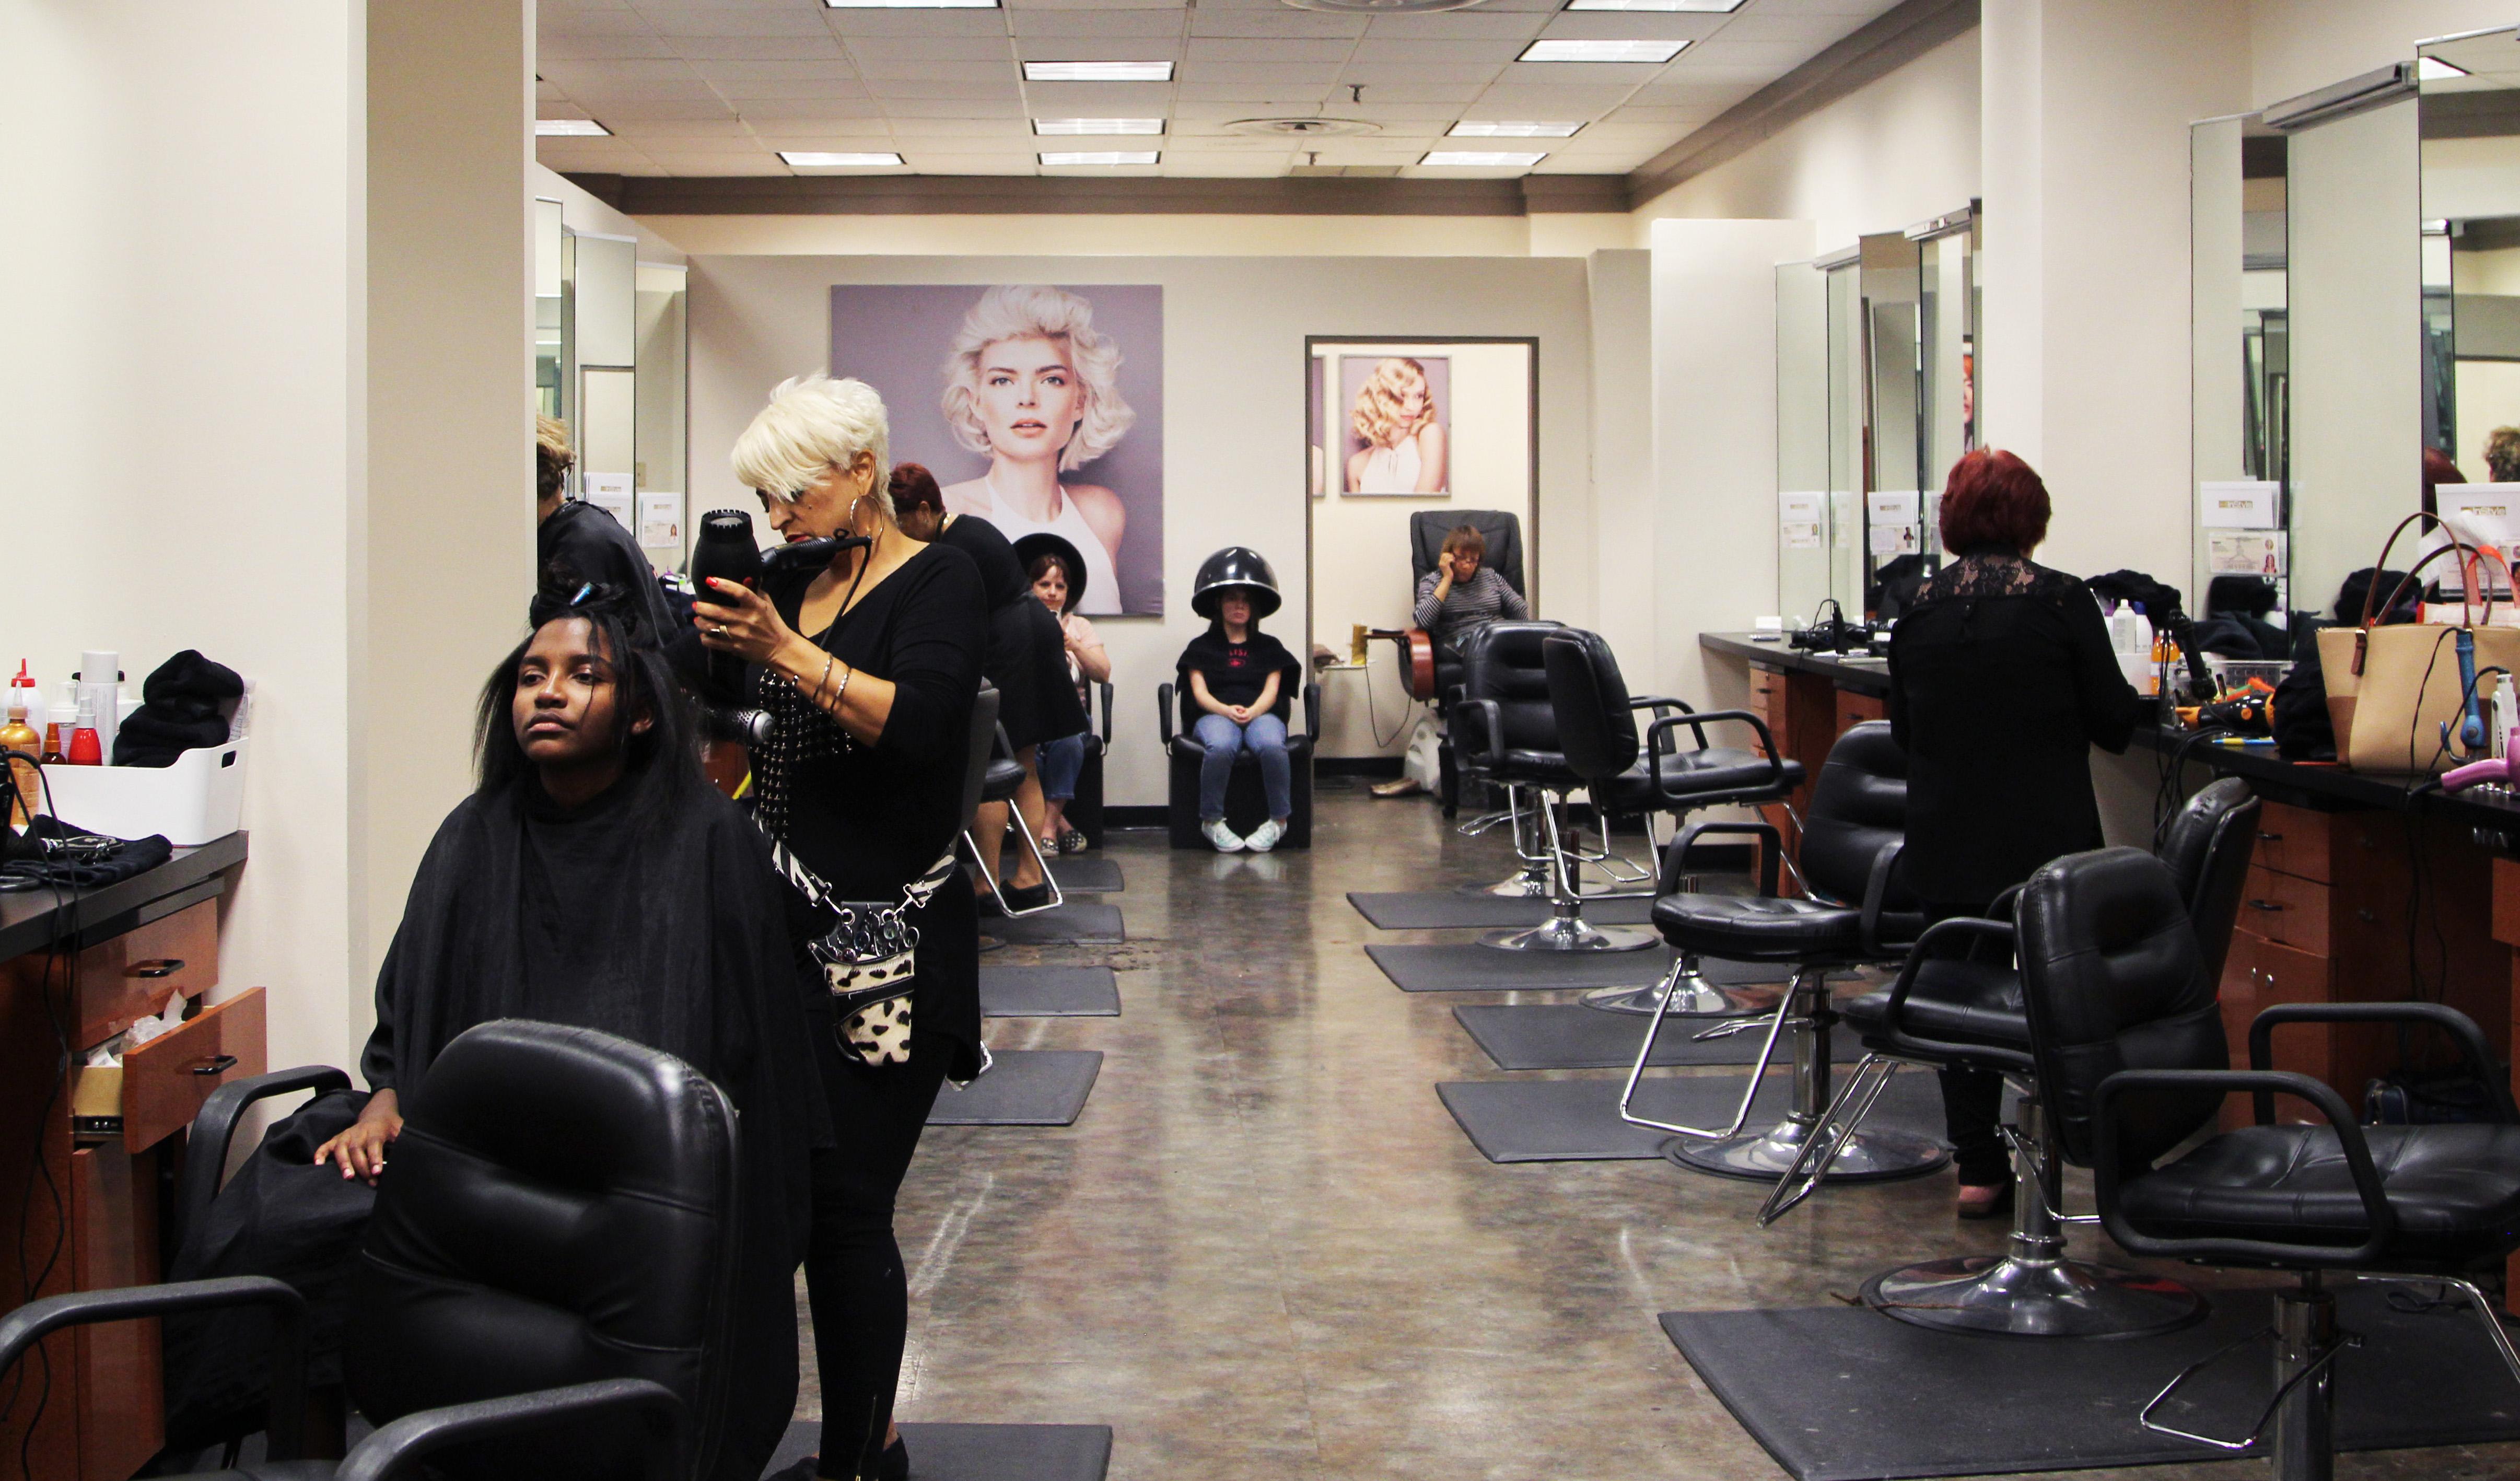 Jcpenney salon deals